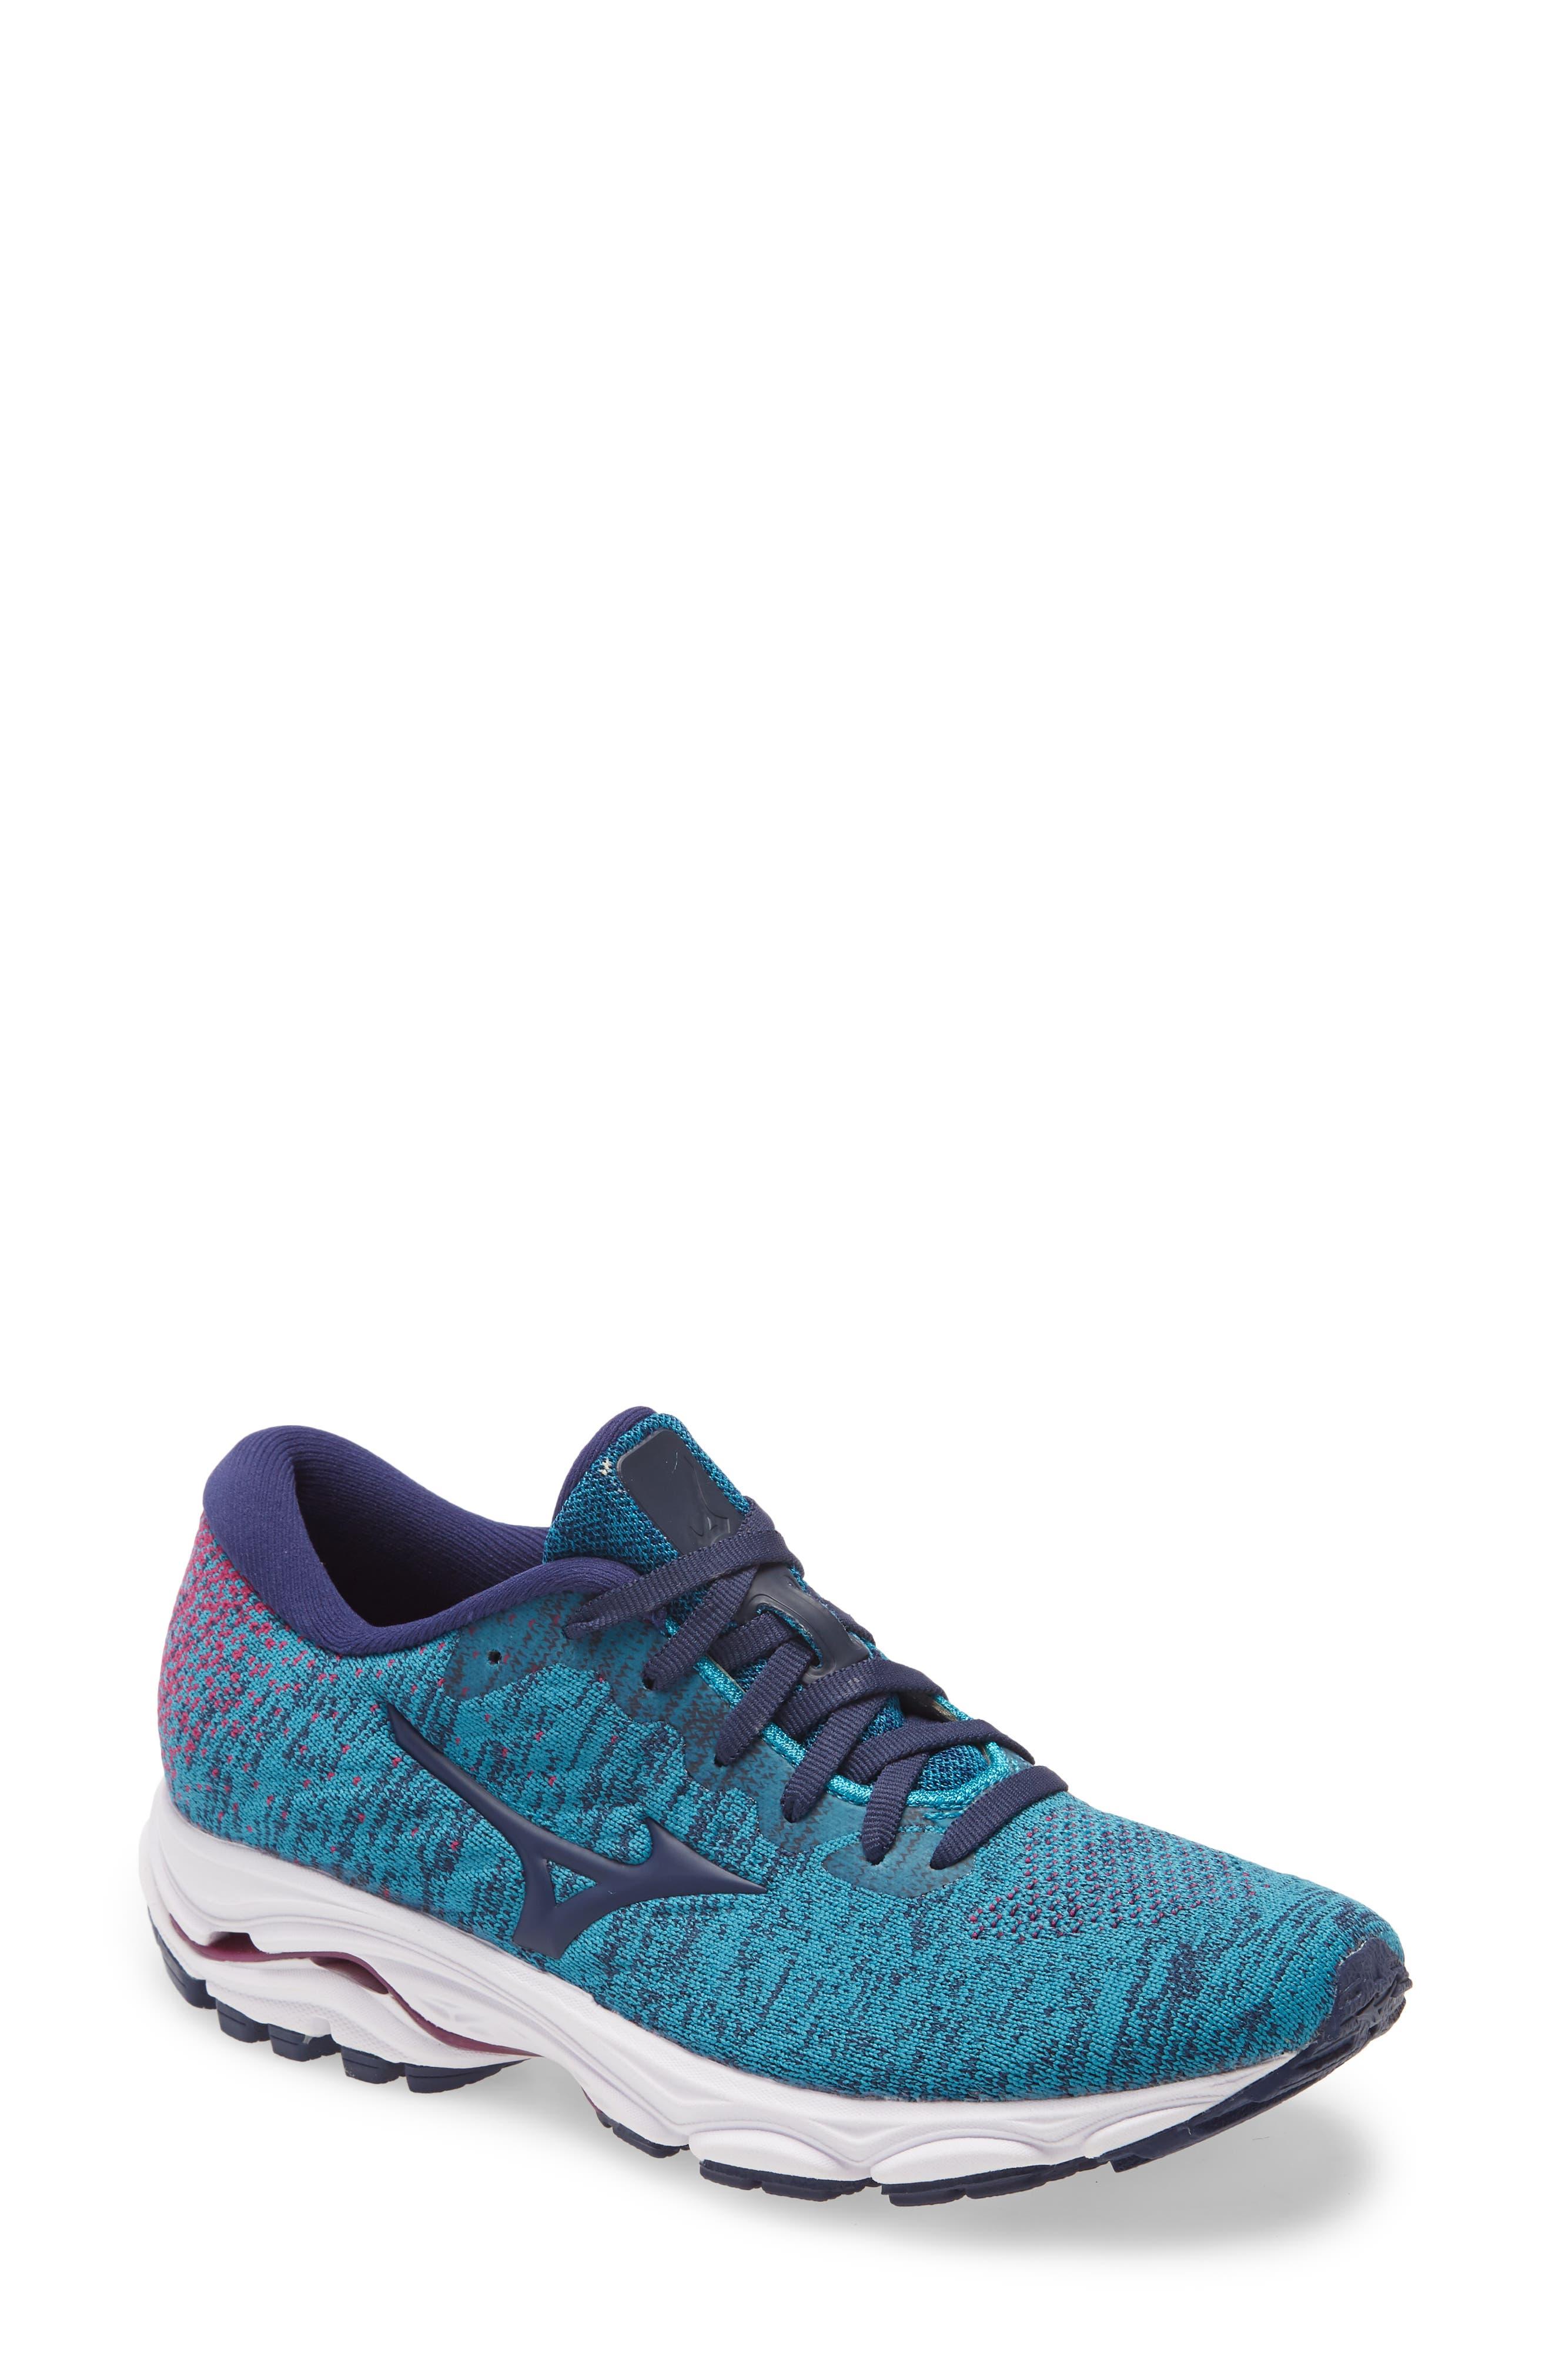 Image of Mizuno Wave Inspire 16 Knit Running Shoe